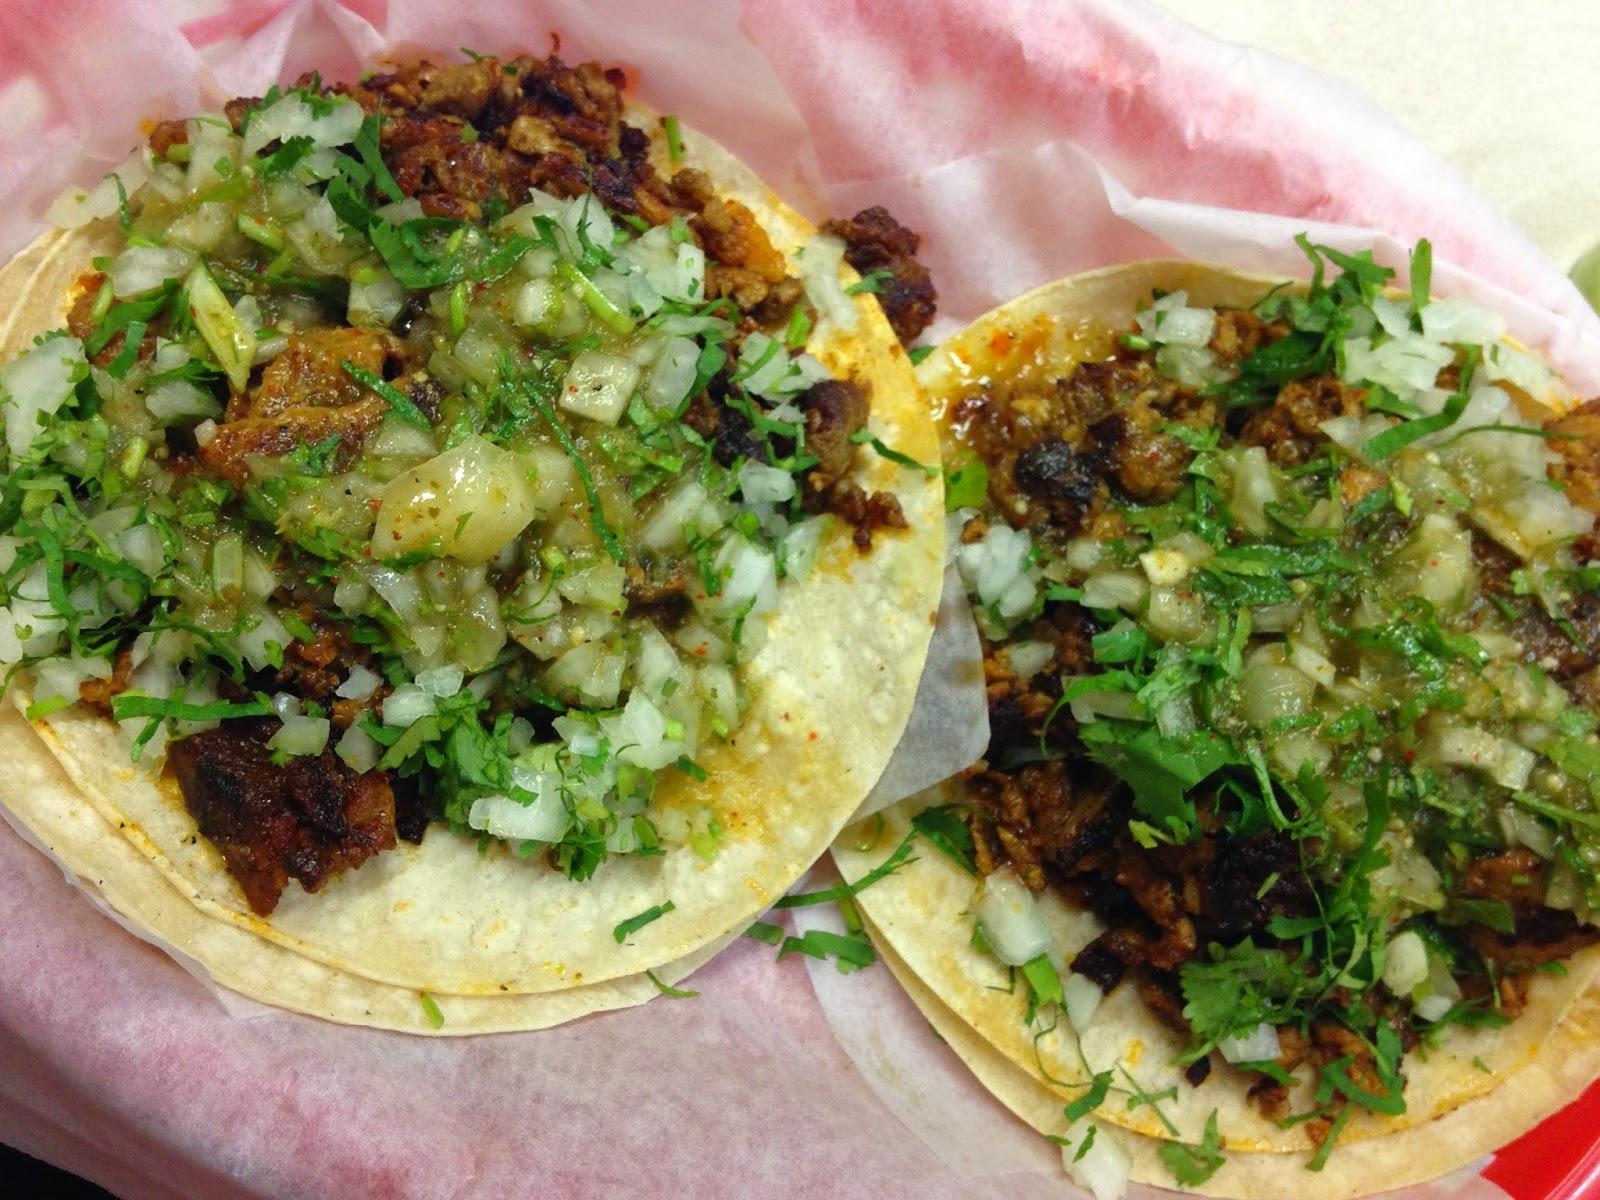 Tacos at El Farolito